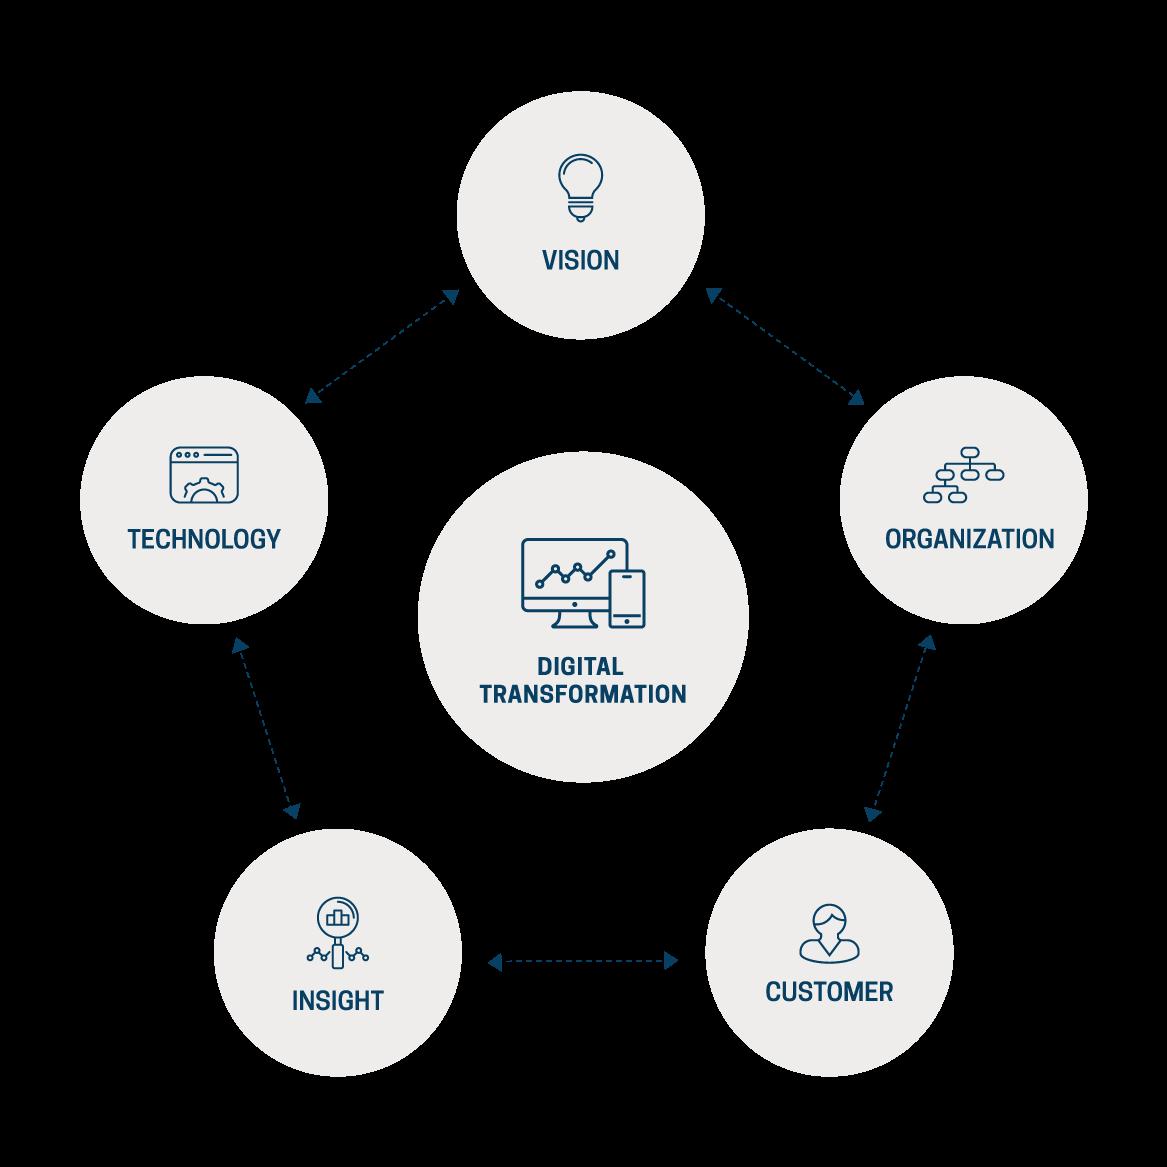 Vision, Organization, Customer, Insight, Technology